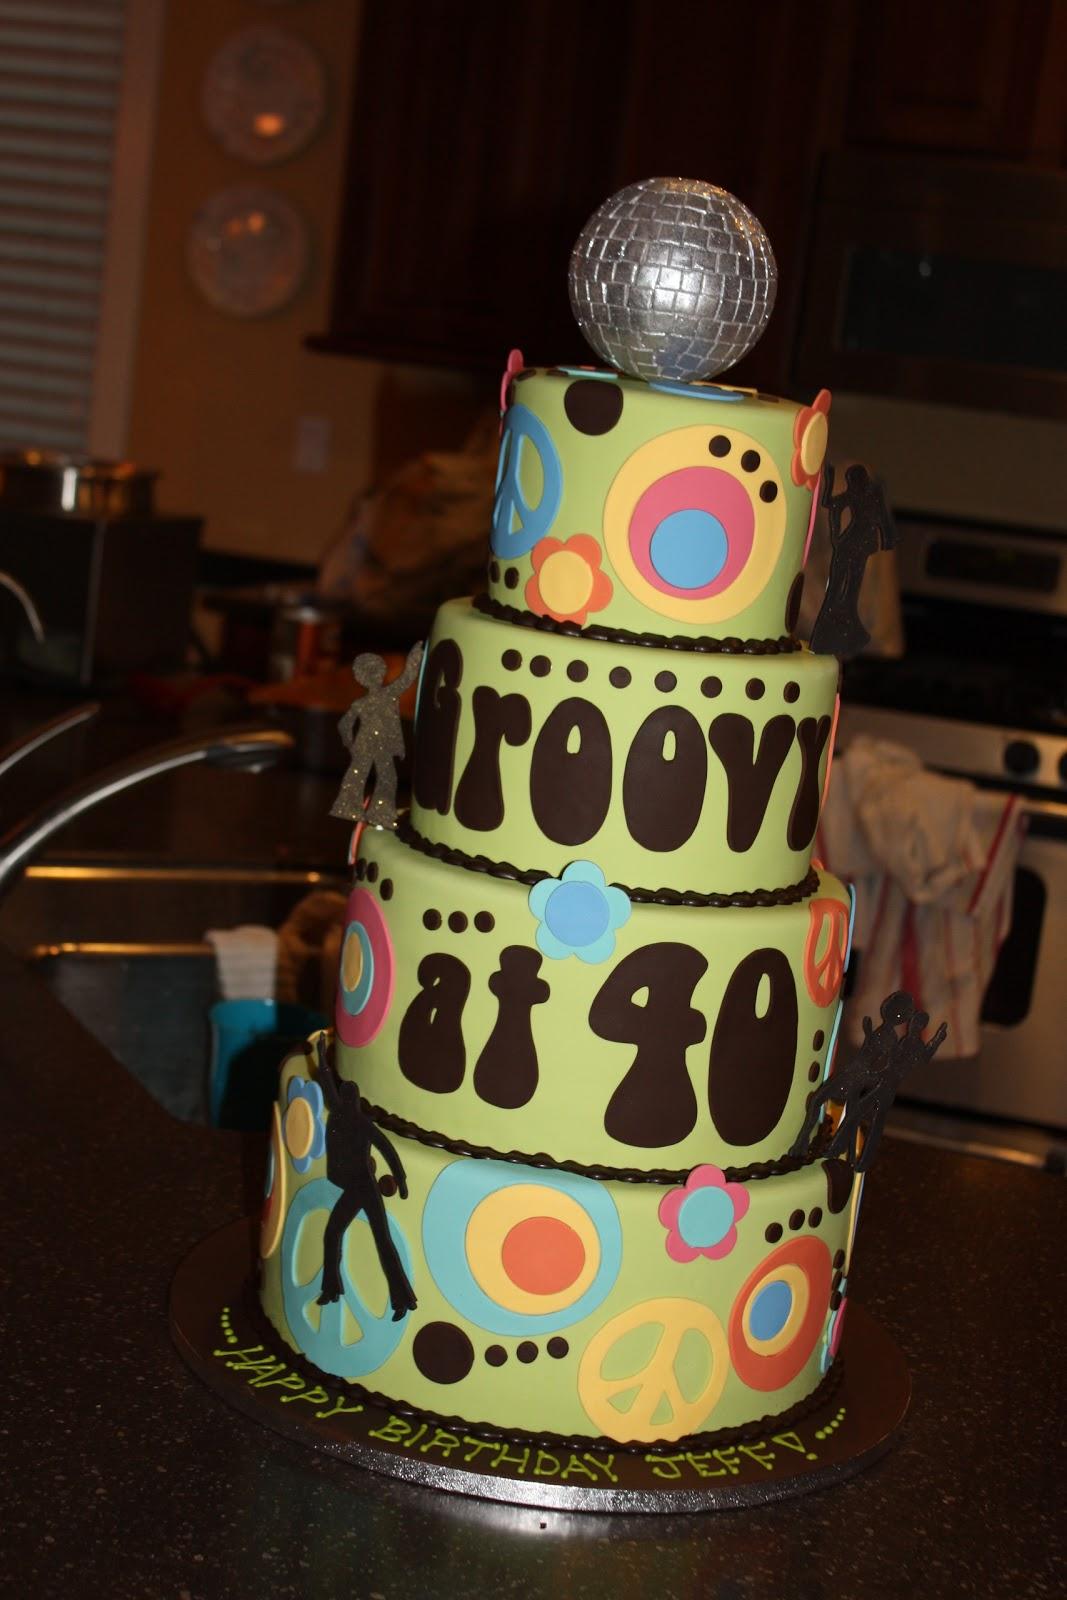 The Good Apple: Jeff's 40th Birthday Cake